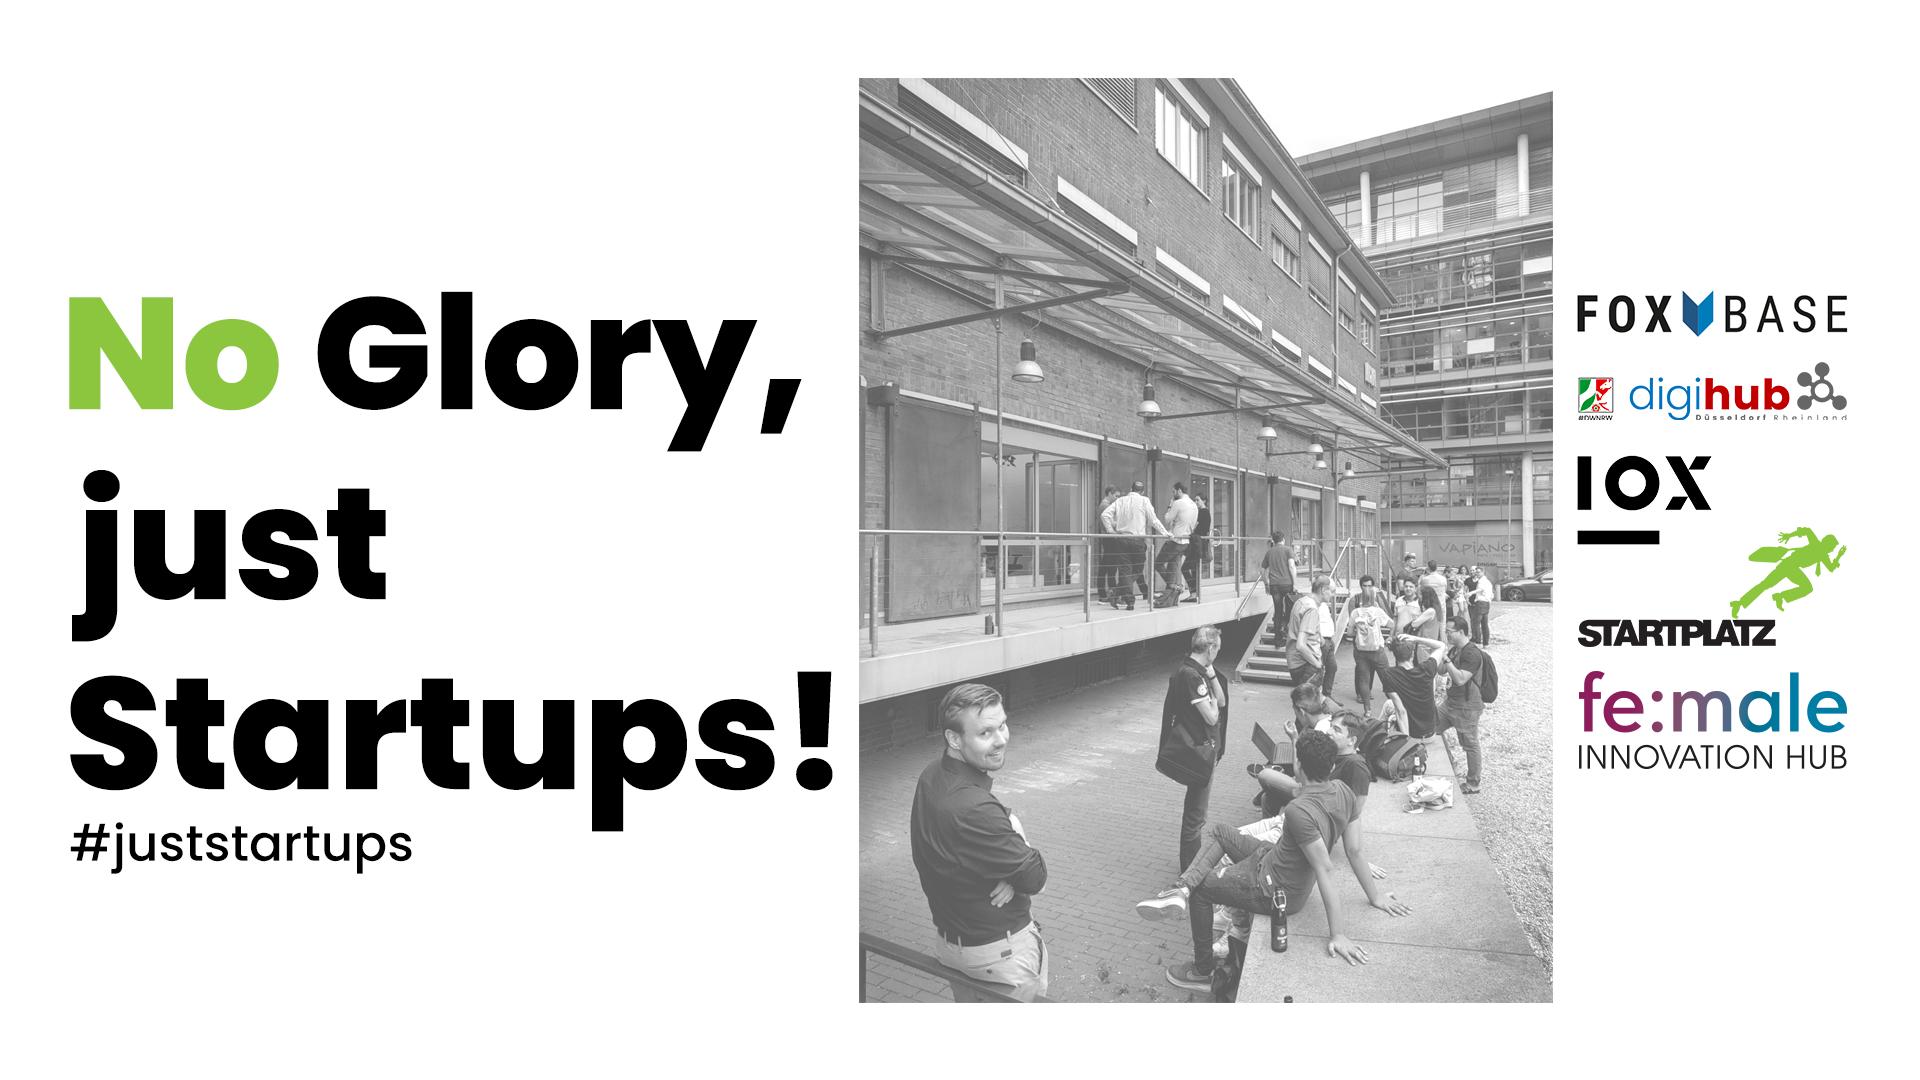 No Glory, just Startups